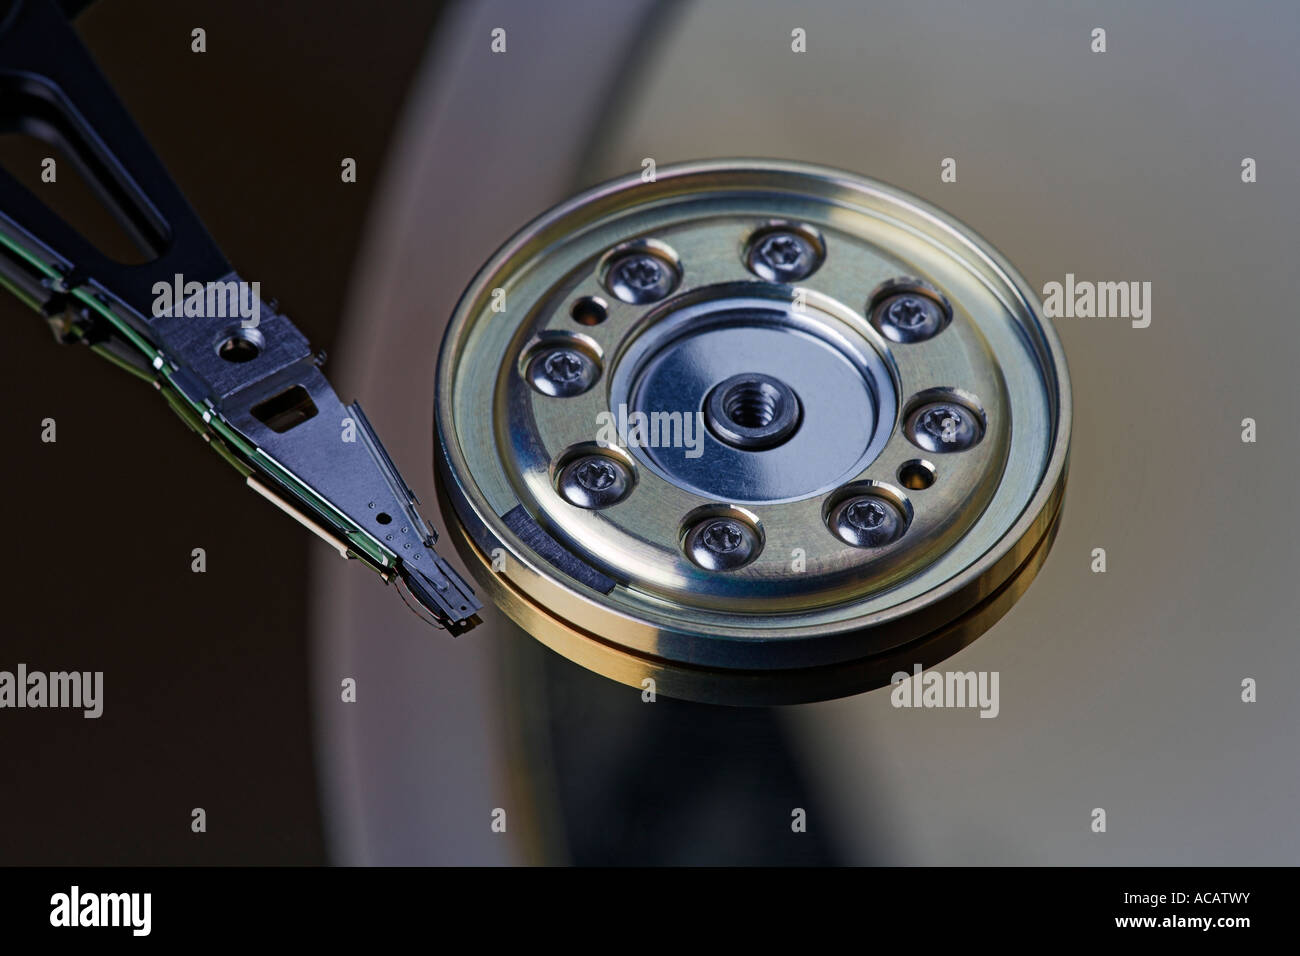 Harddisc, inside, platter, read-write head, actuator arm Stock Photo